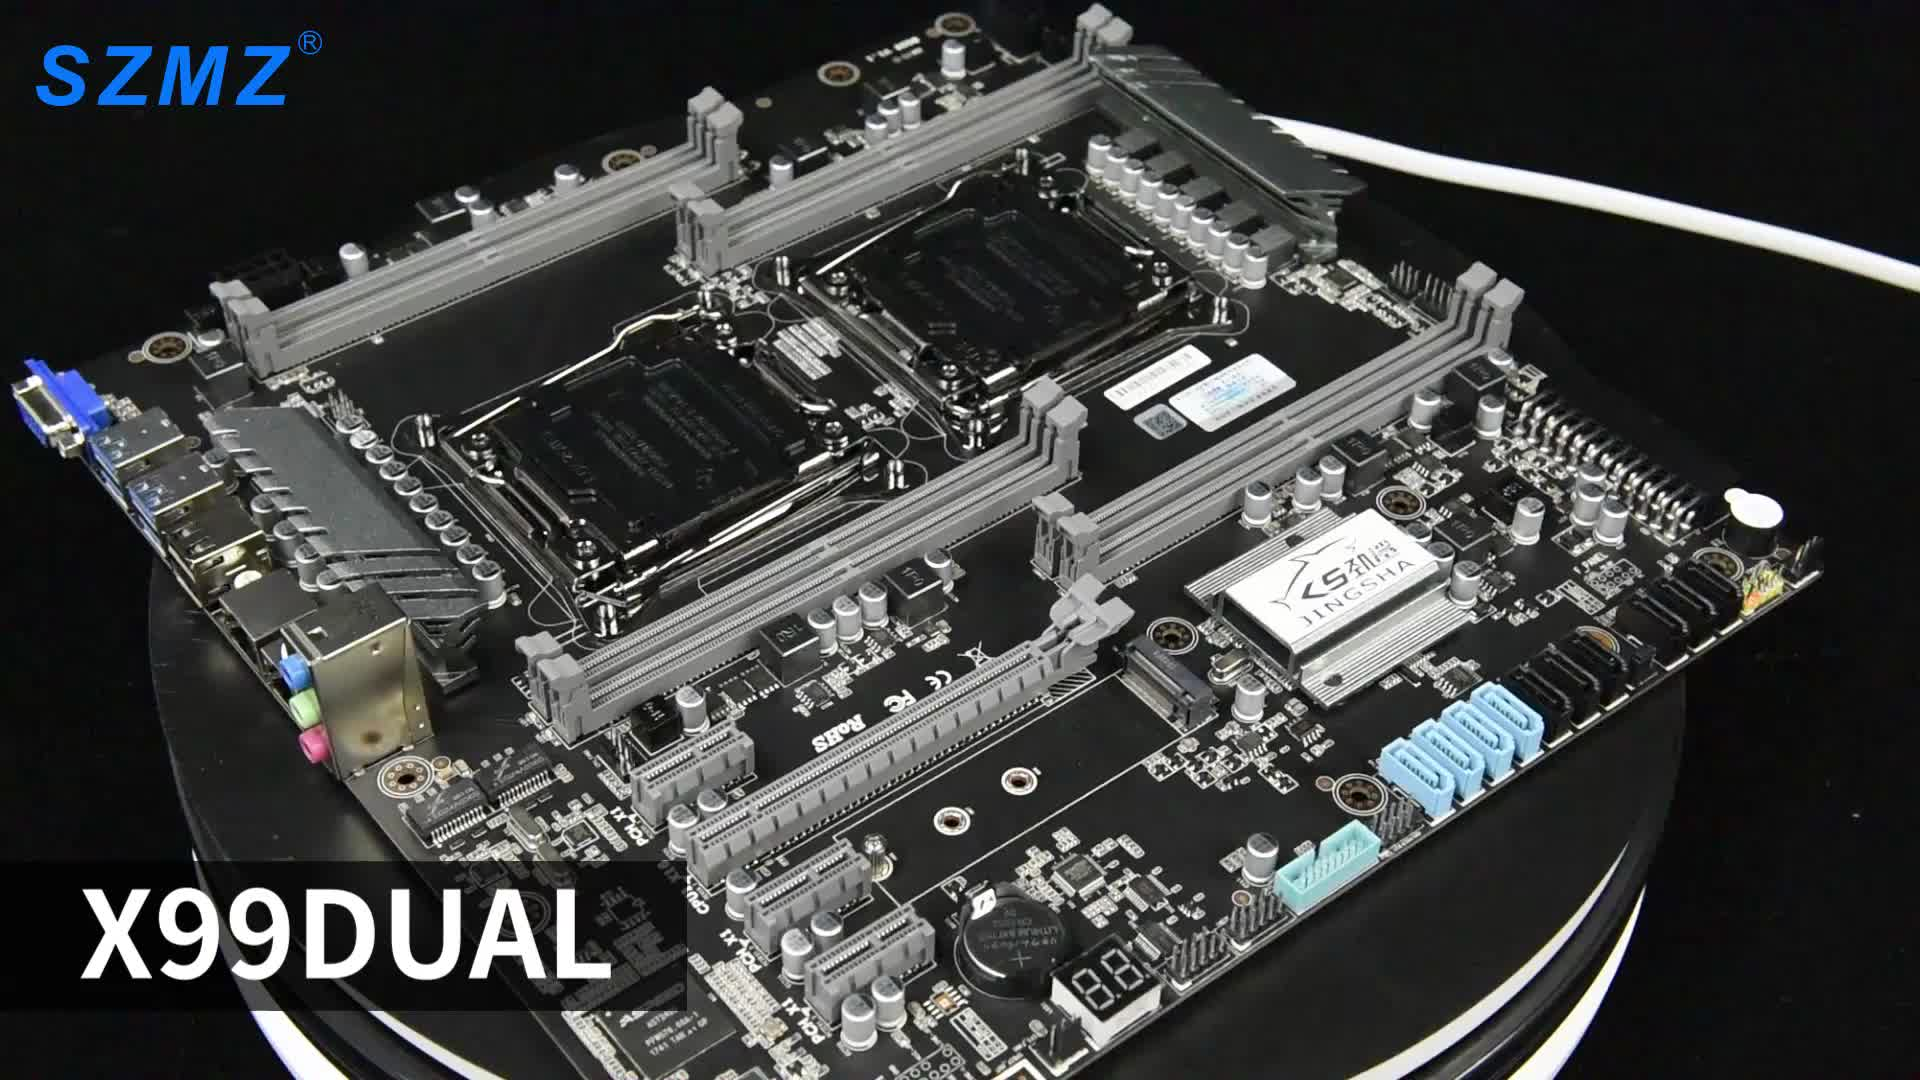 World premiere  lga2011 v3 v4 socket x99 dual x99 chipset 128GB motherboard